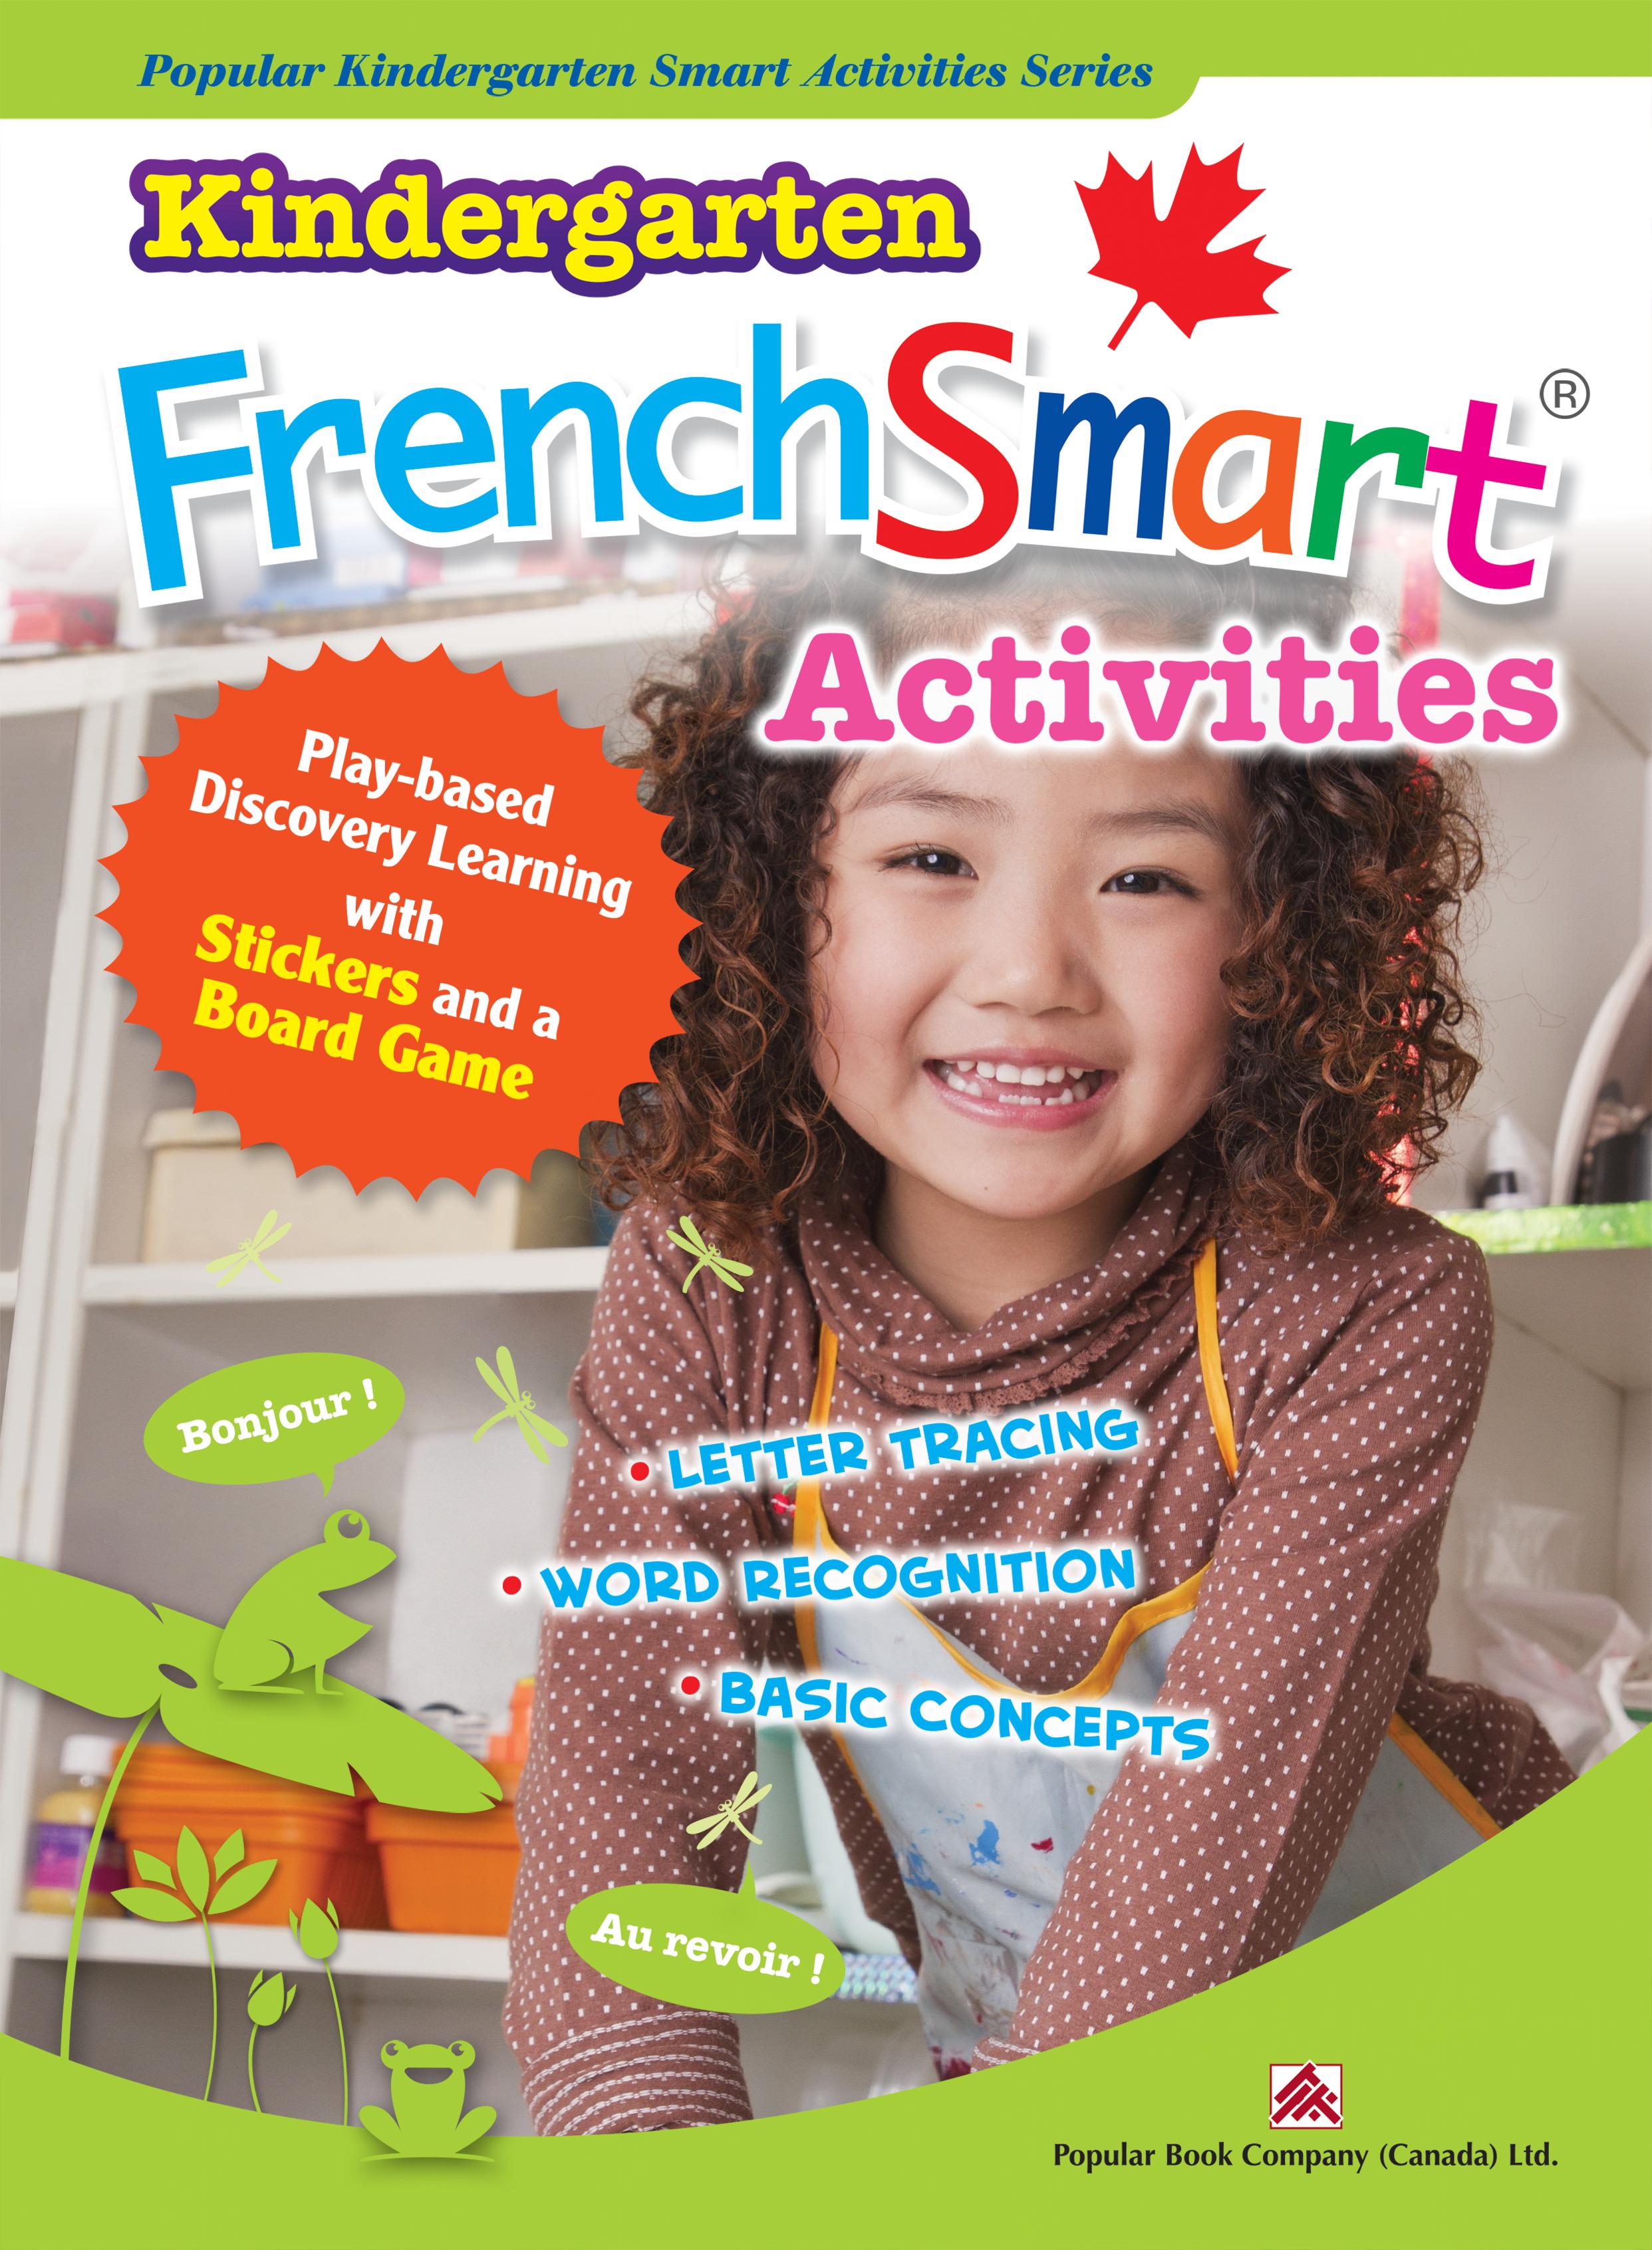 Kindergarten Archives - Popular Book Company (USA) Ltd.